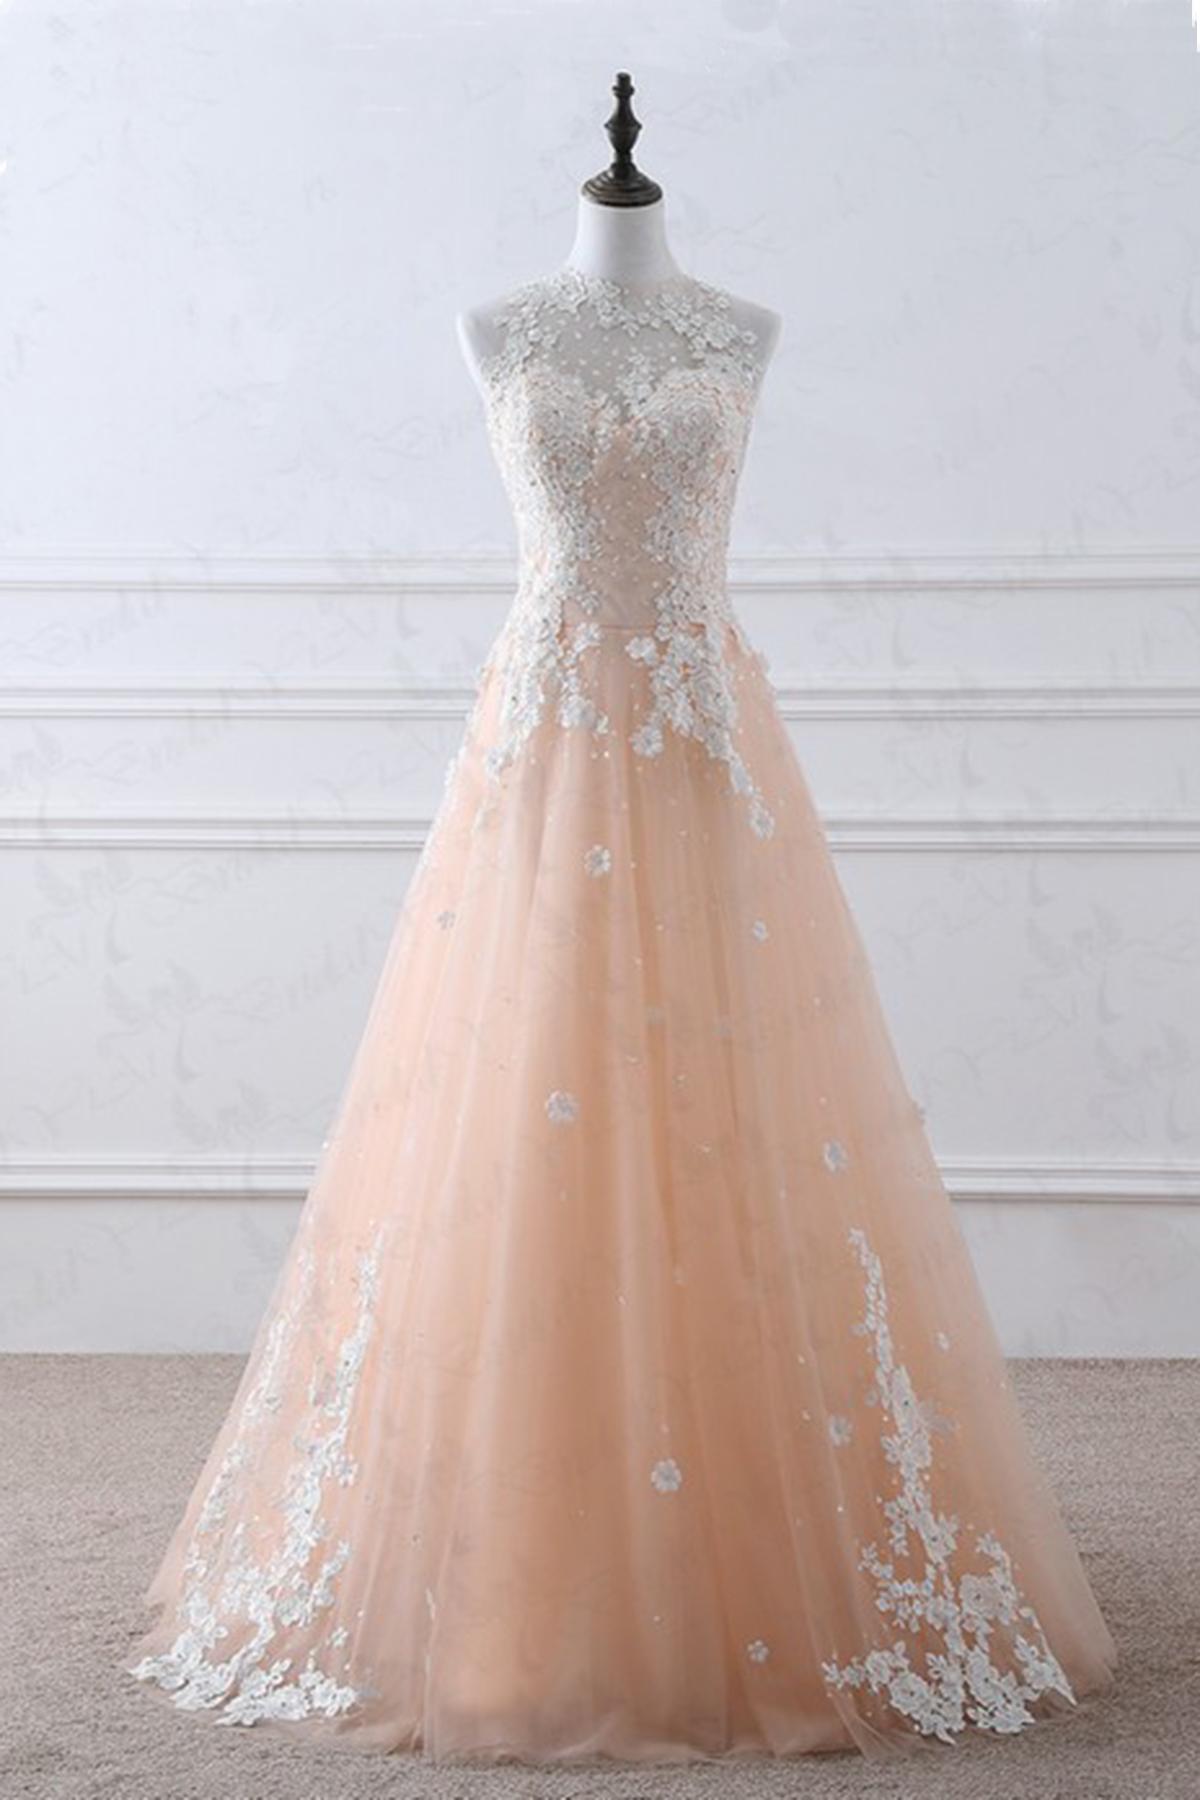 Blush Pink High Neck Long Flower Lace Appliqus Long Senior Prom